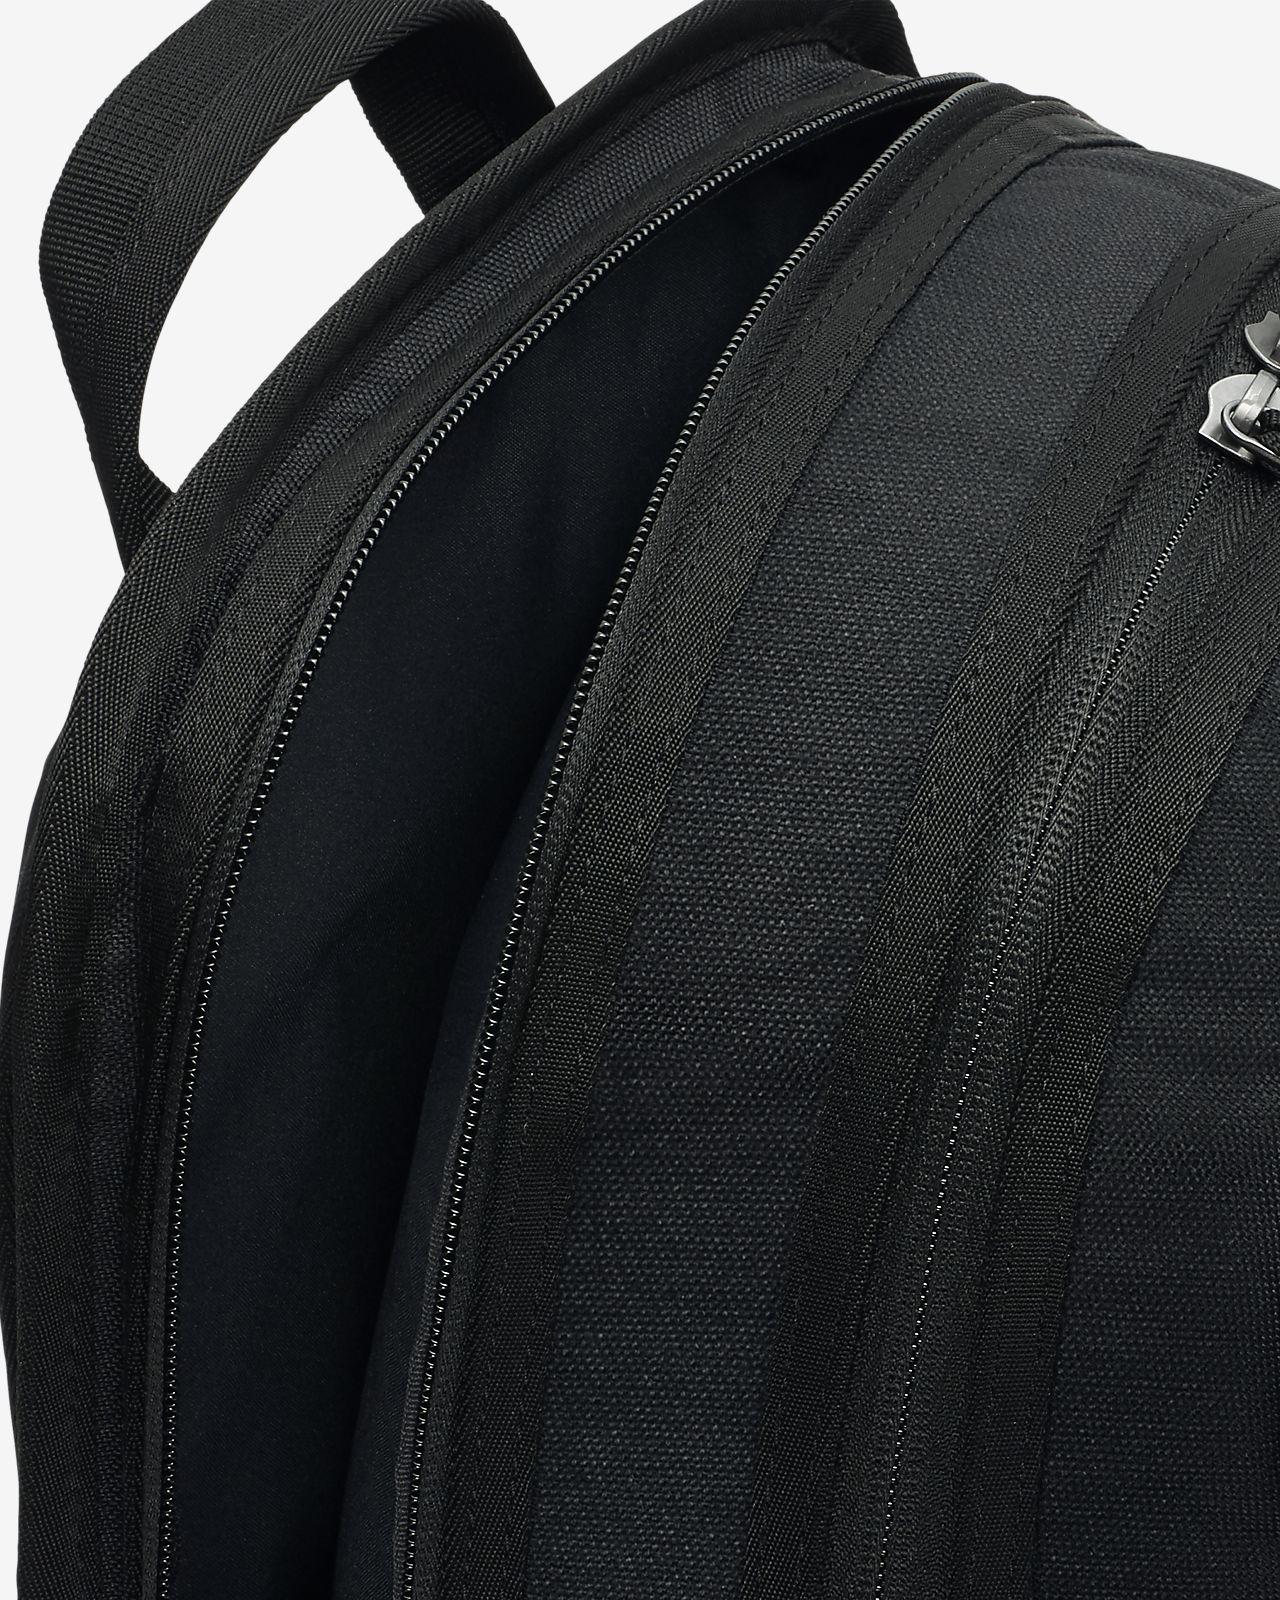 Low Resolution Nike SB RPM Skateboarding Backpack Nike SB RPM Skateboarding  Backpack 2b00e91bb478f